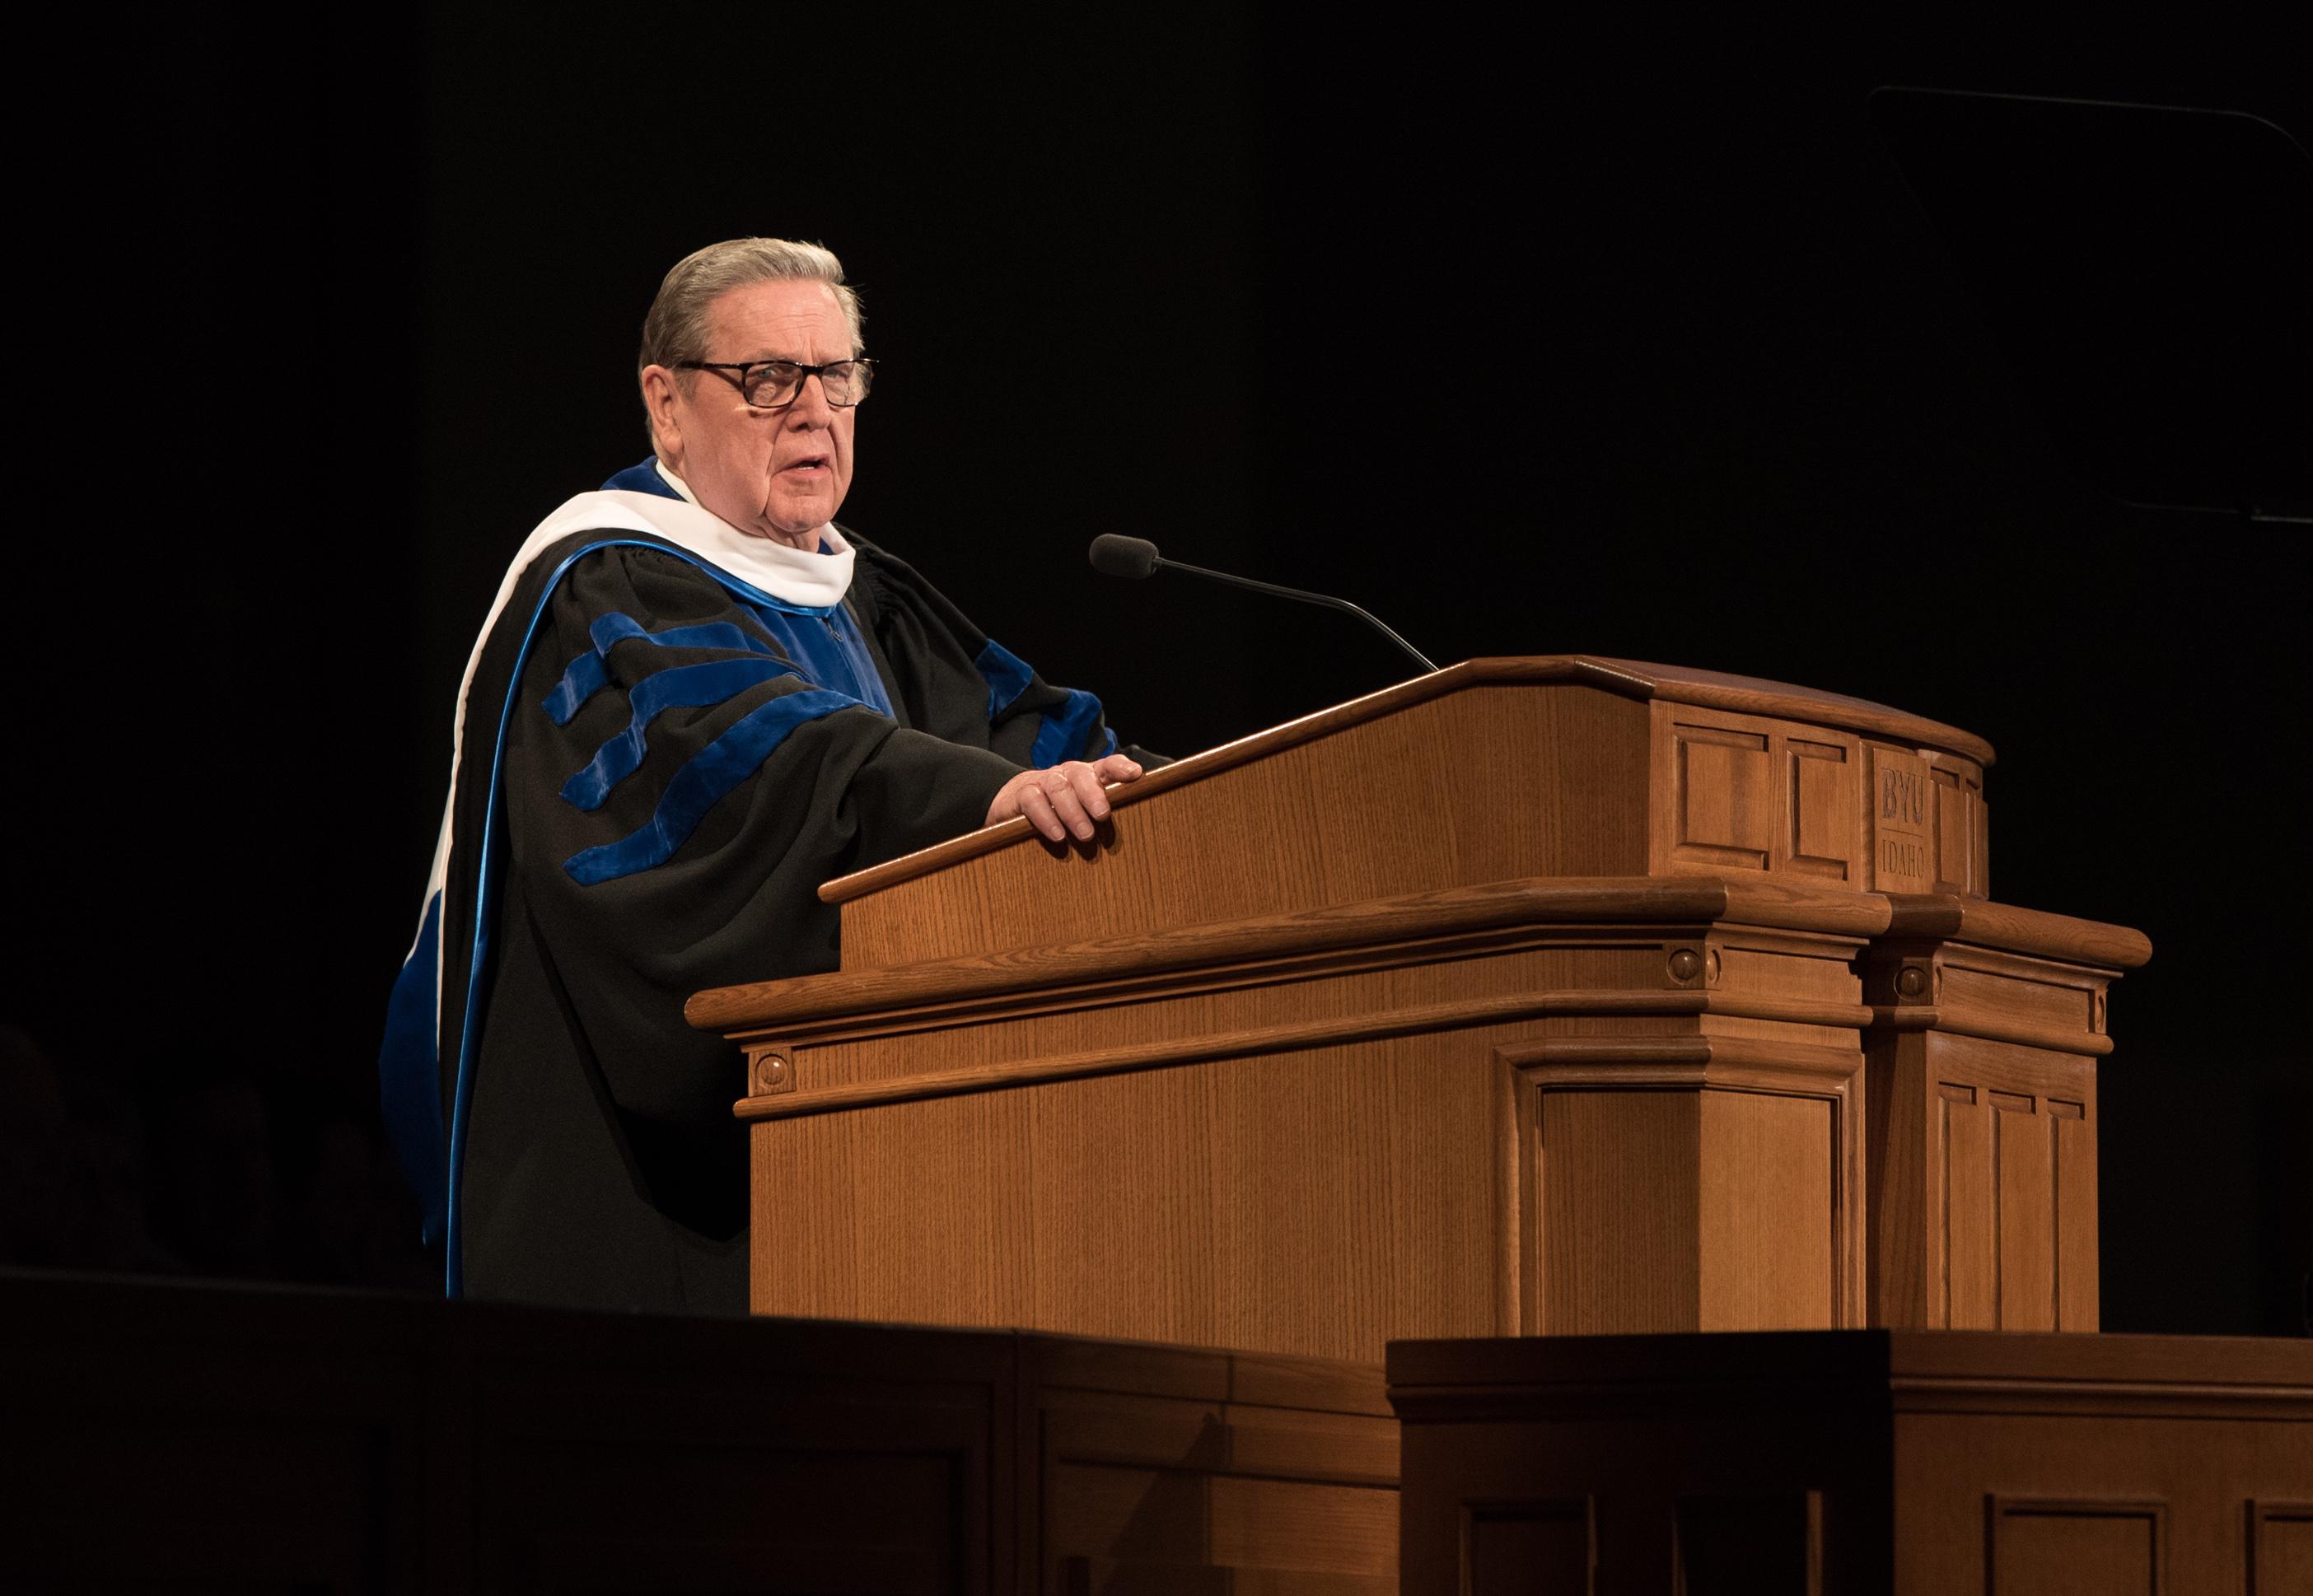 Elder Jeffrey R. Holland speaks at the April 12, 2019, BYU-Idaho Winter Commencement.